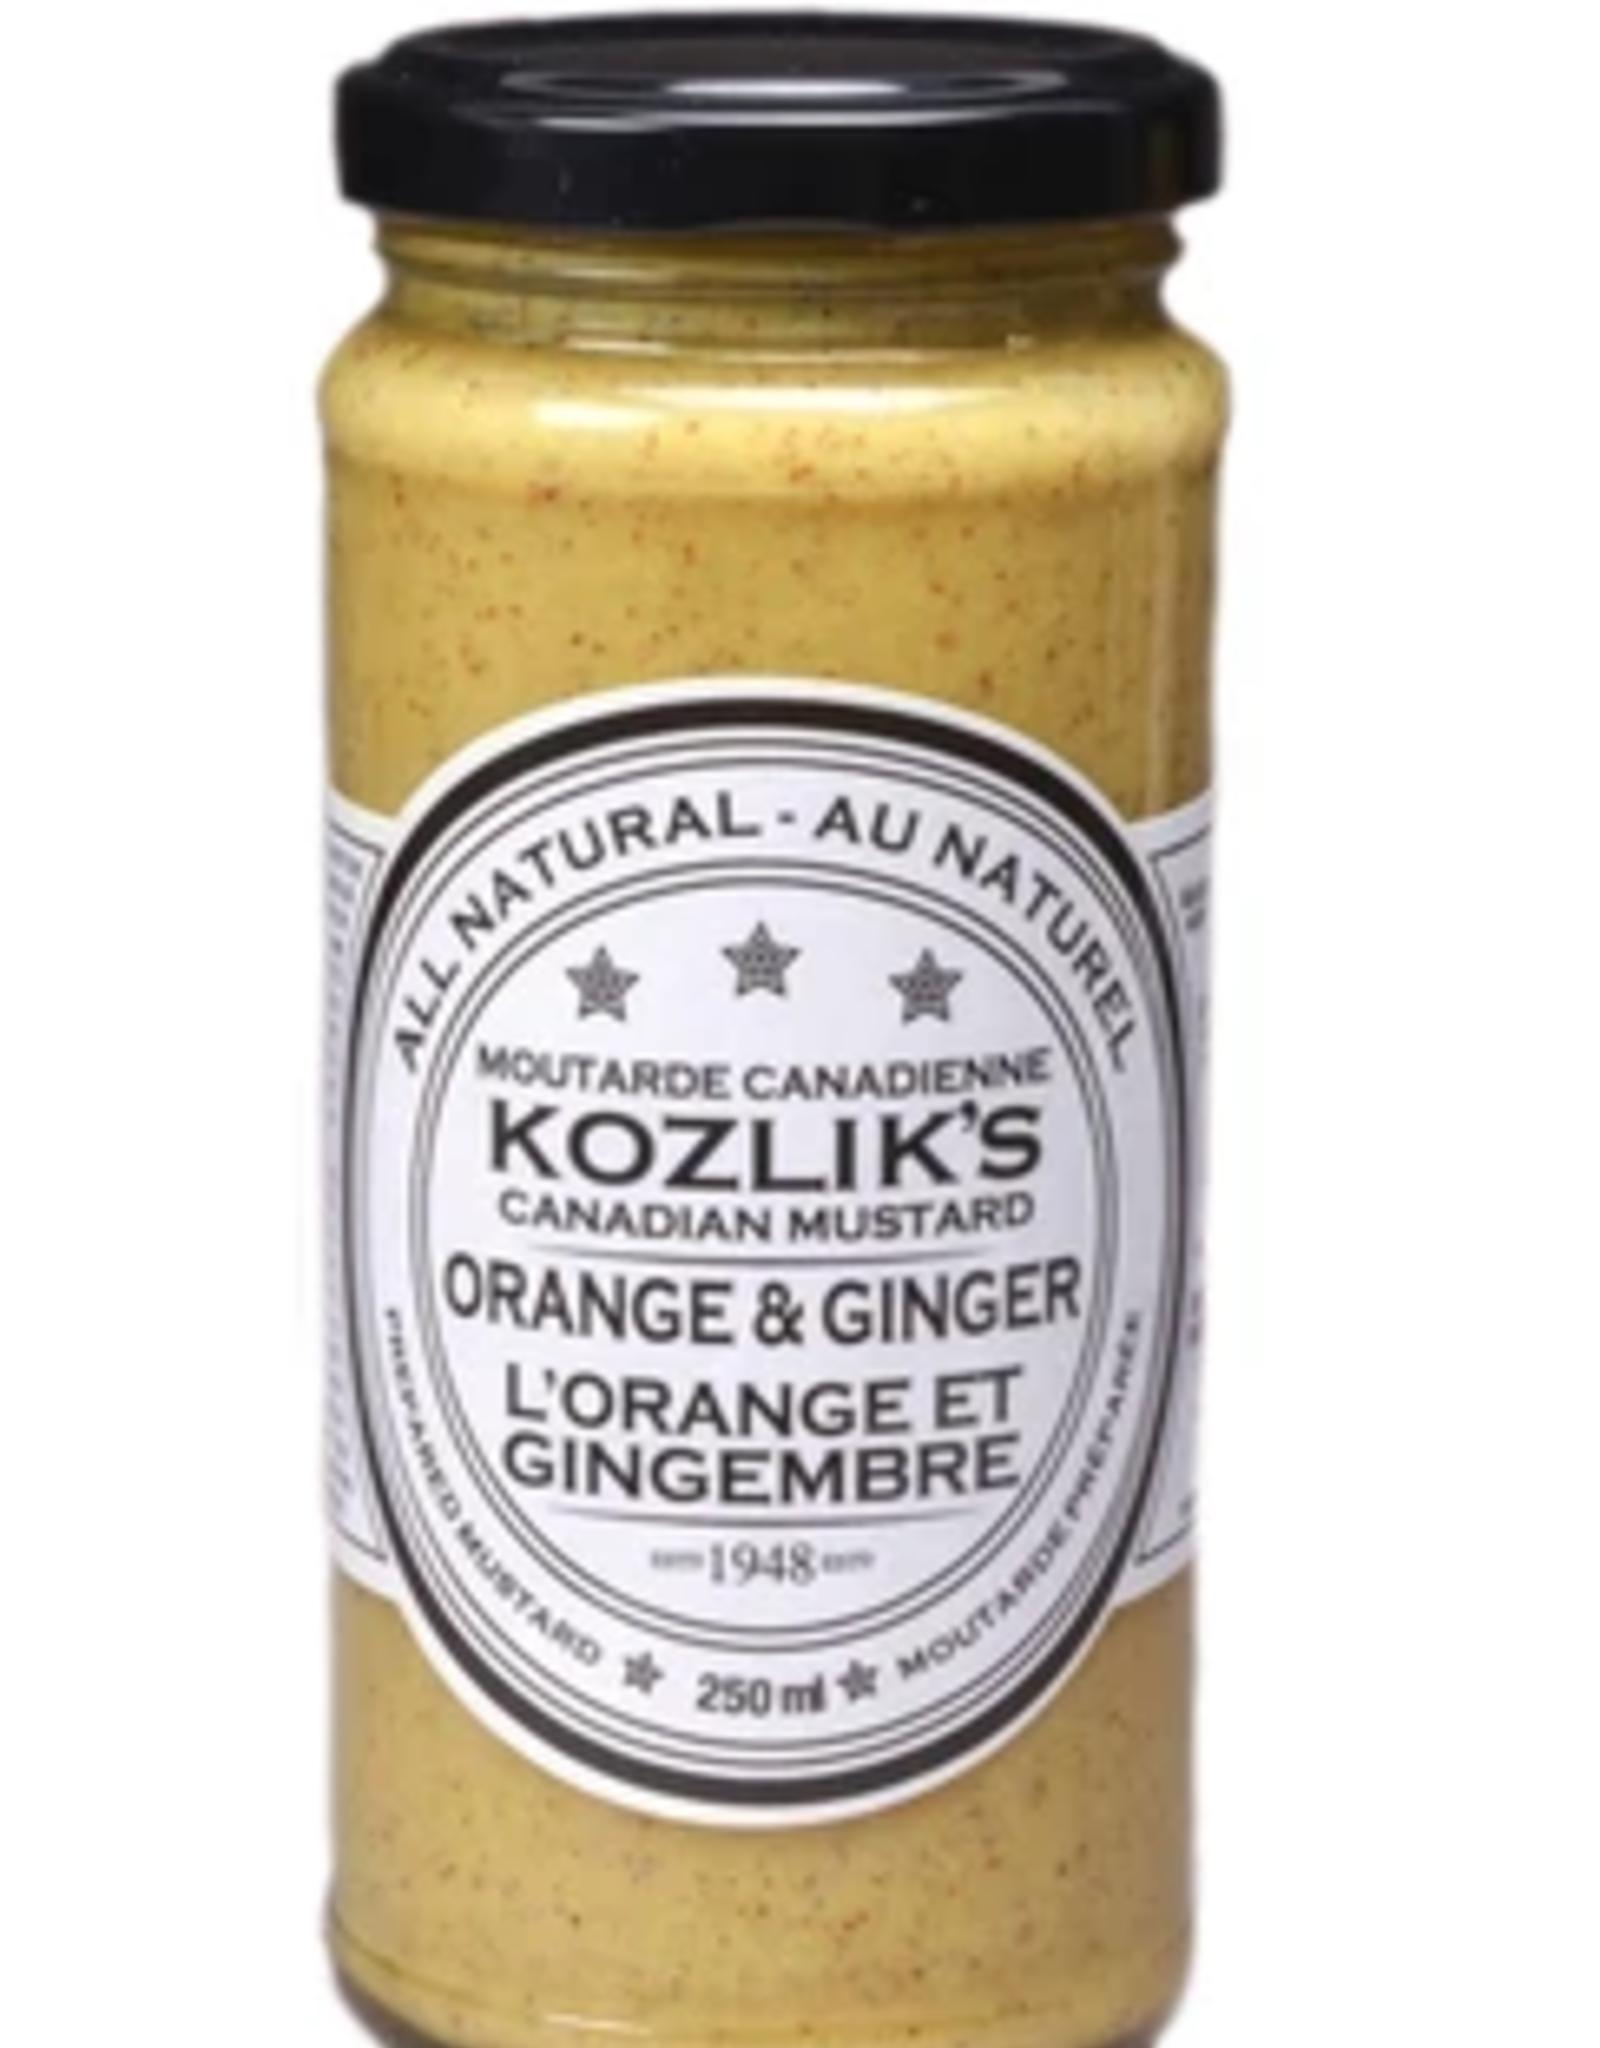 Kozlik's Orange and Ginger Mustard